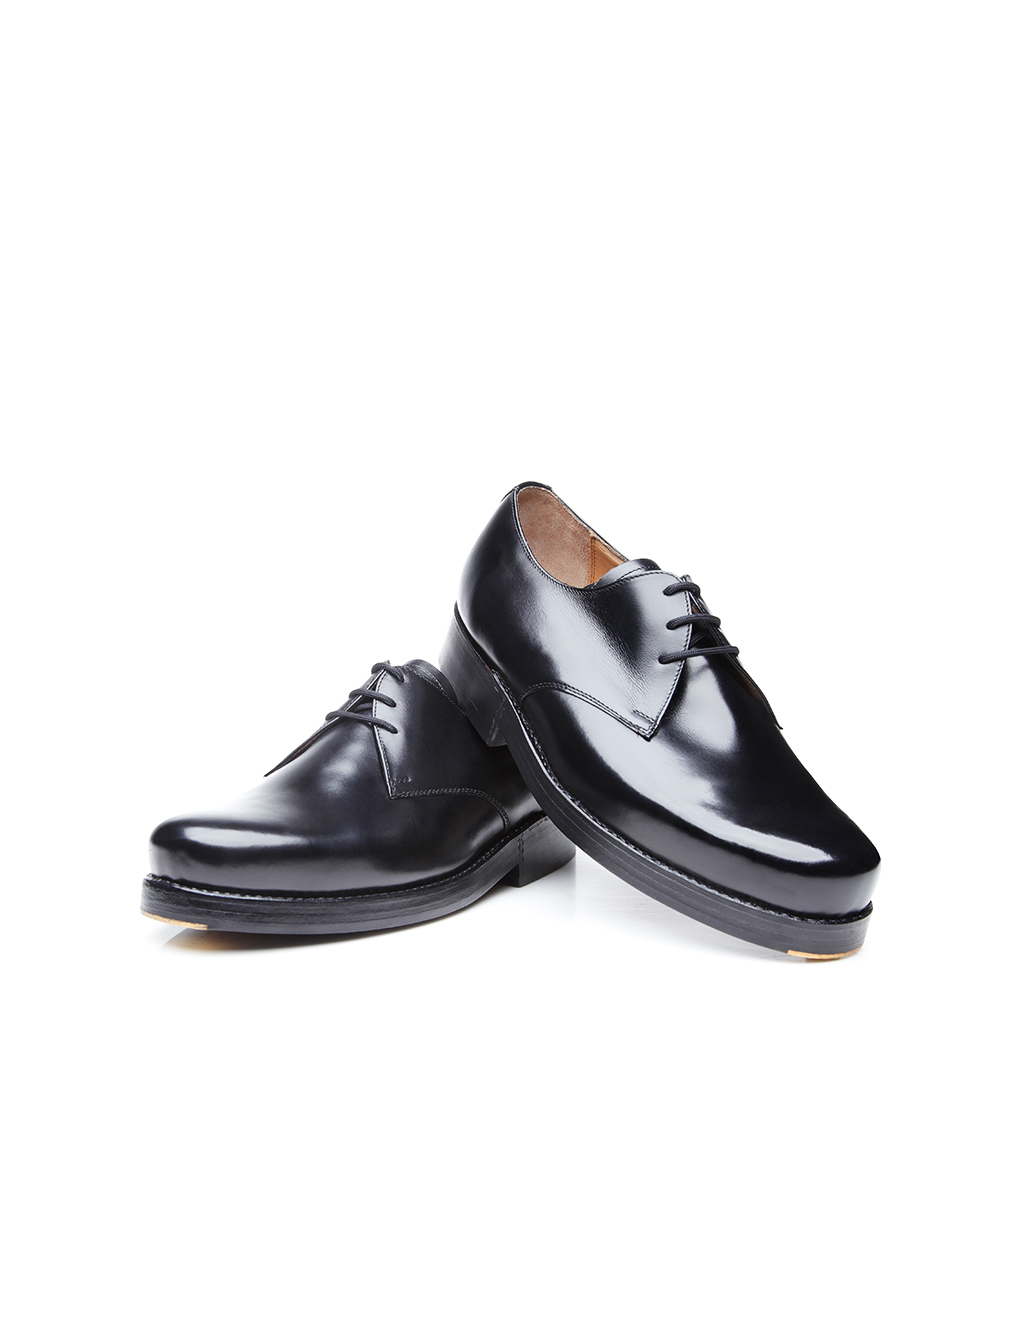 detailed look 3042a 42cc8 Heinrich Dinkelacker   Luxury men's shoes